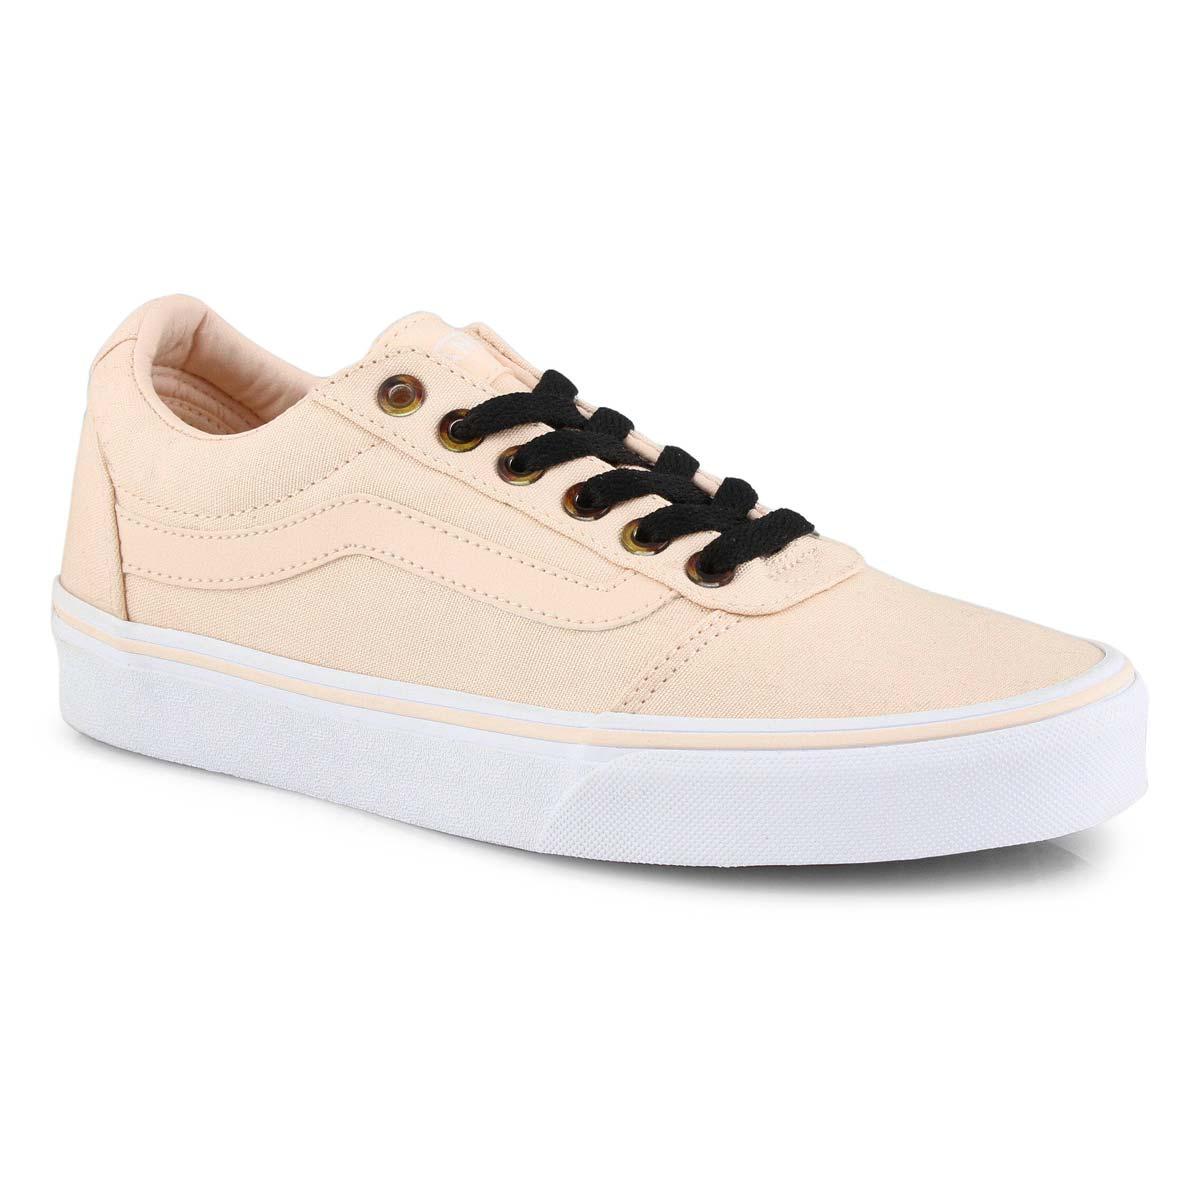 Women's Ward Sneaker - Creme De Peche/White